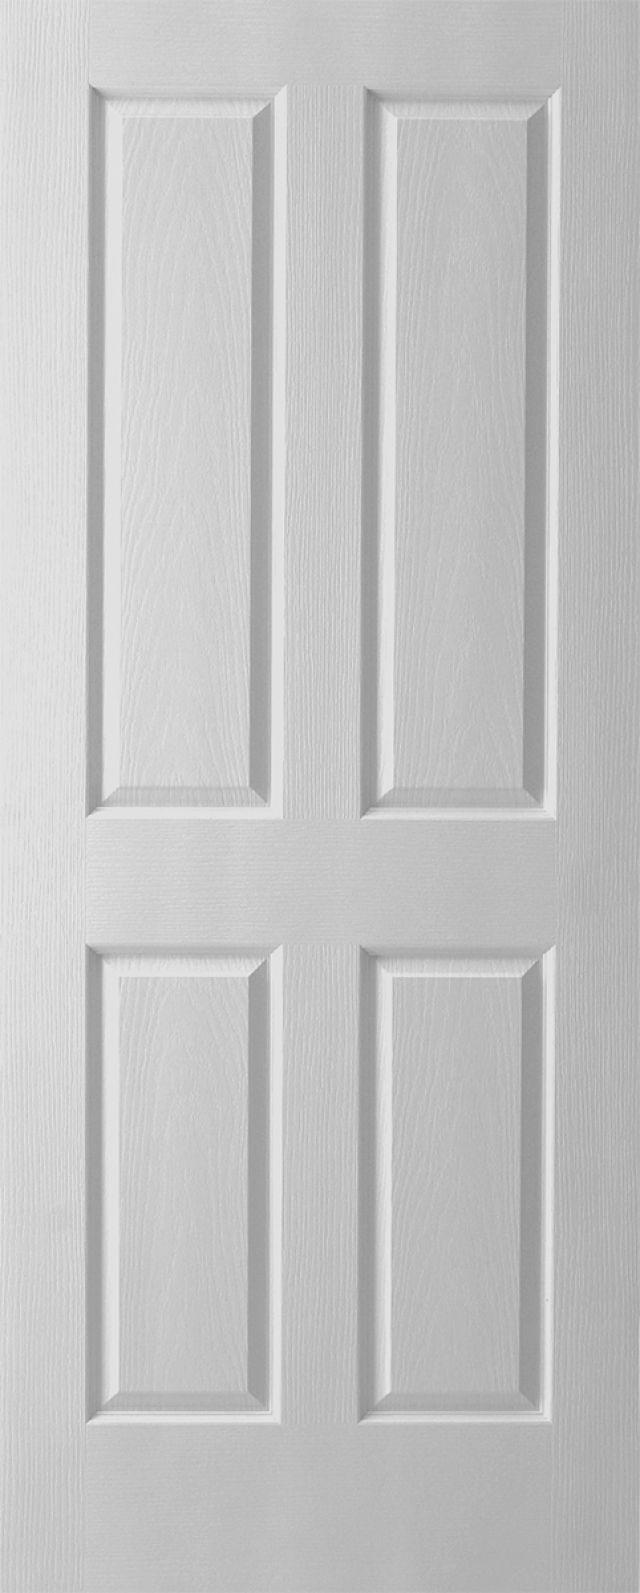 XB2  sc 1 st  Hume Doors & Hume Doors